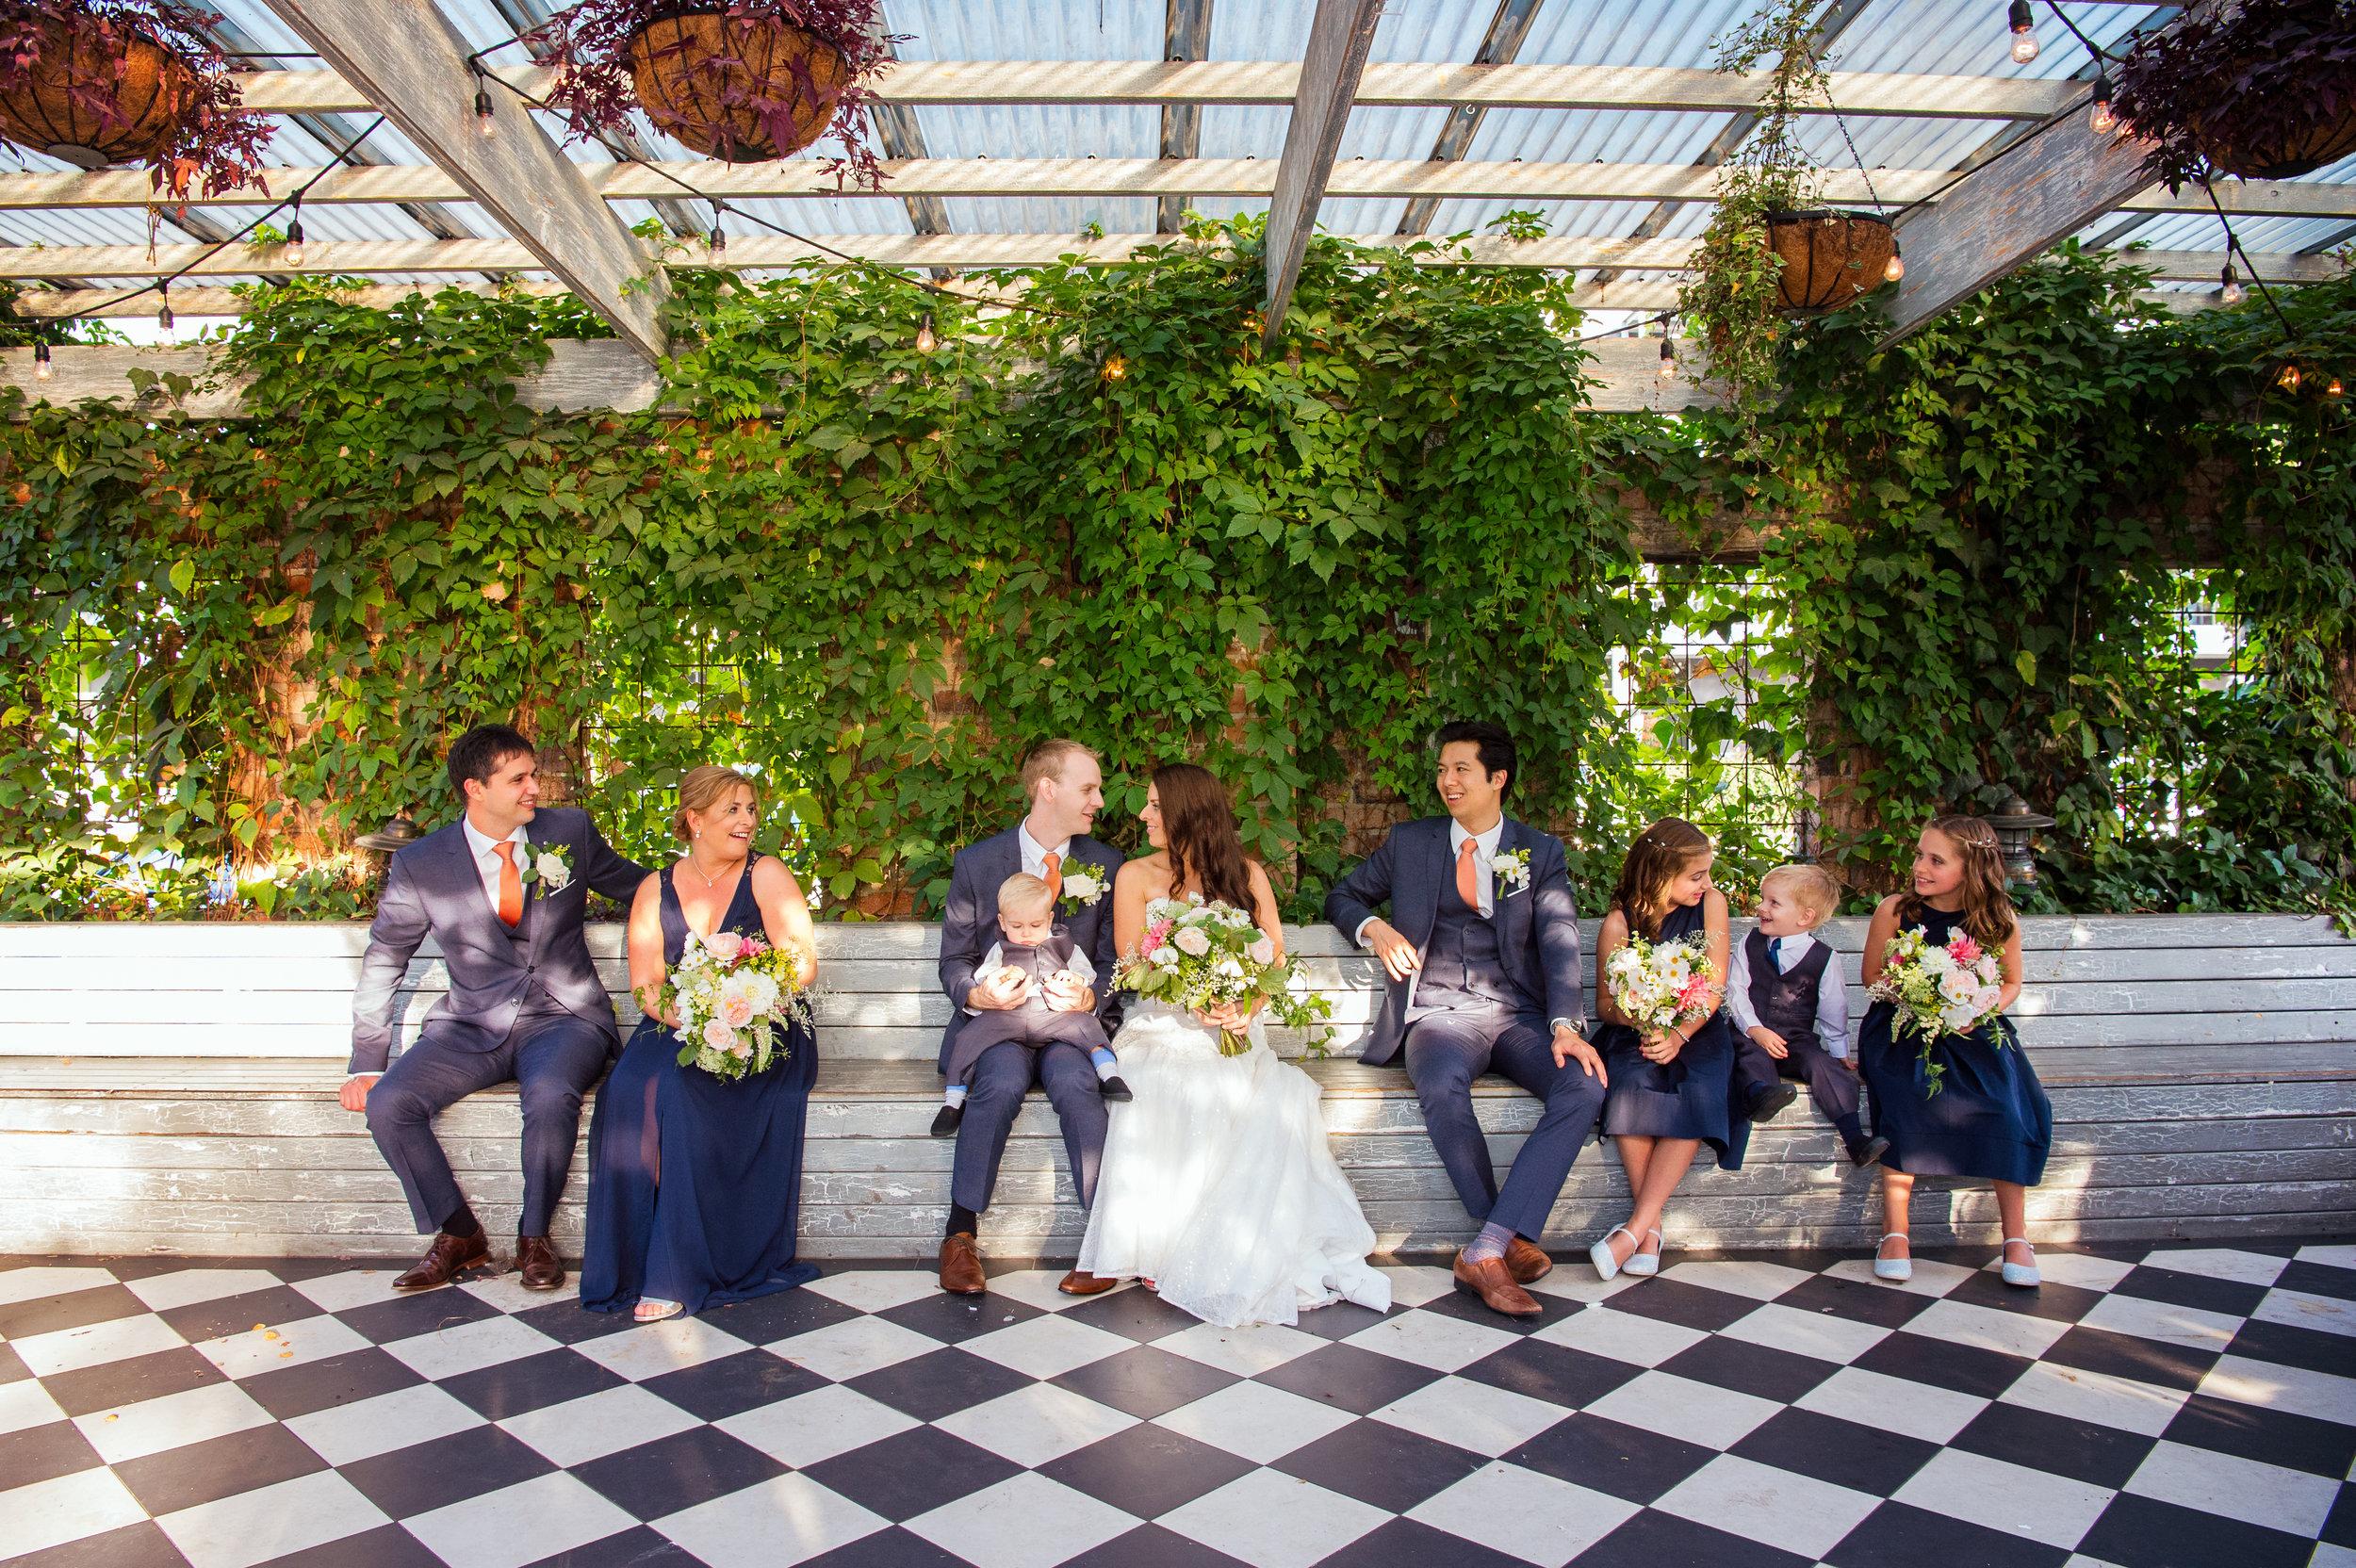 5-Tips-to-Choosing-your-Creative-Wedding-Locations-Sydney-2.jpg